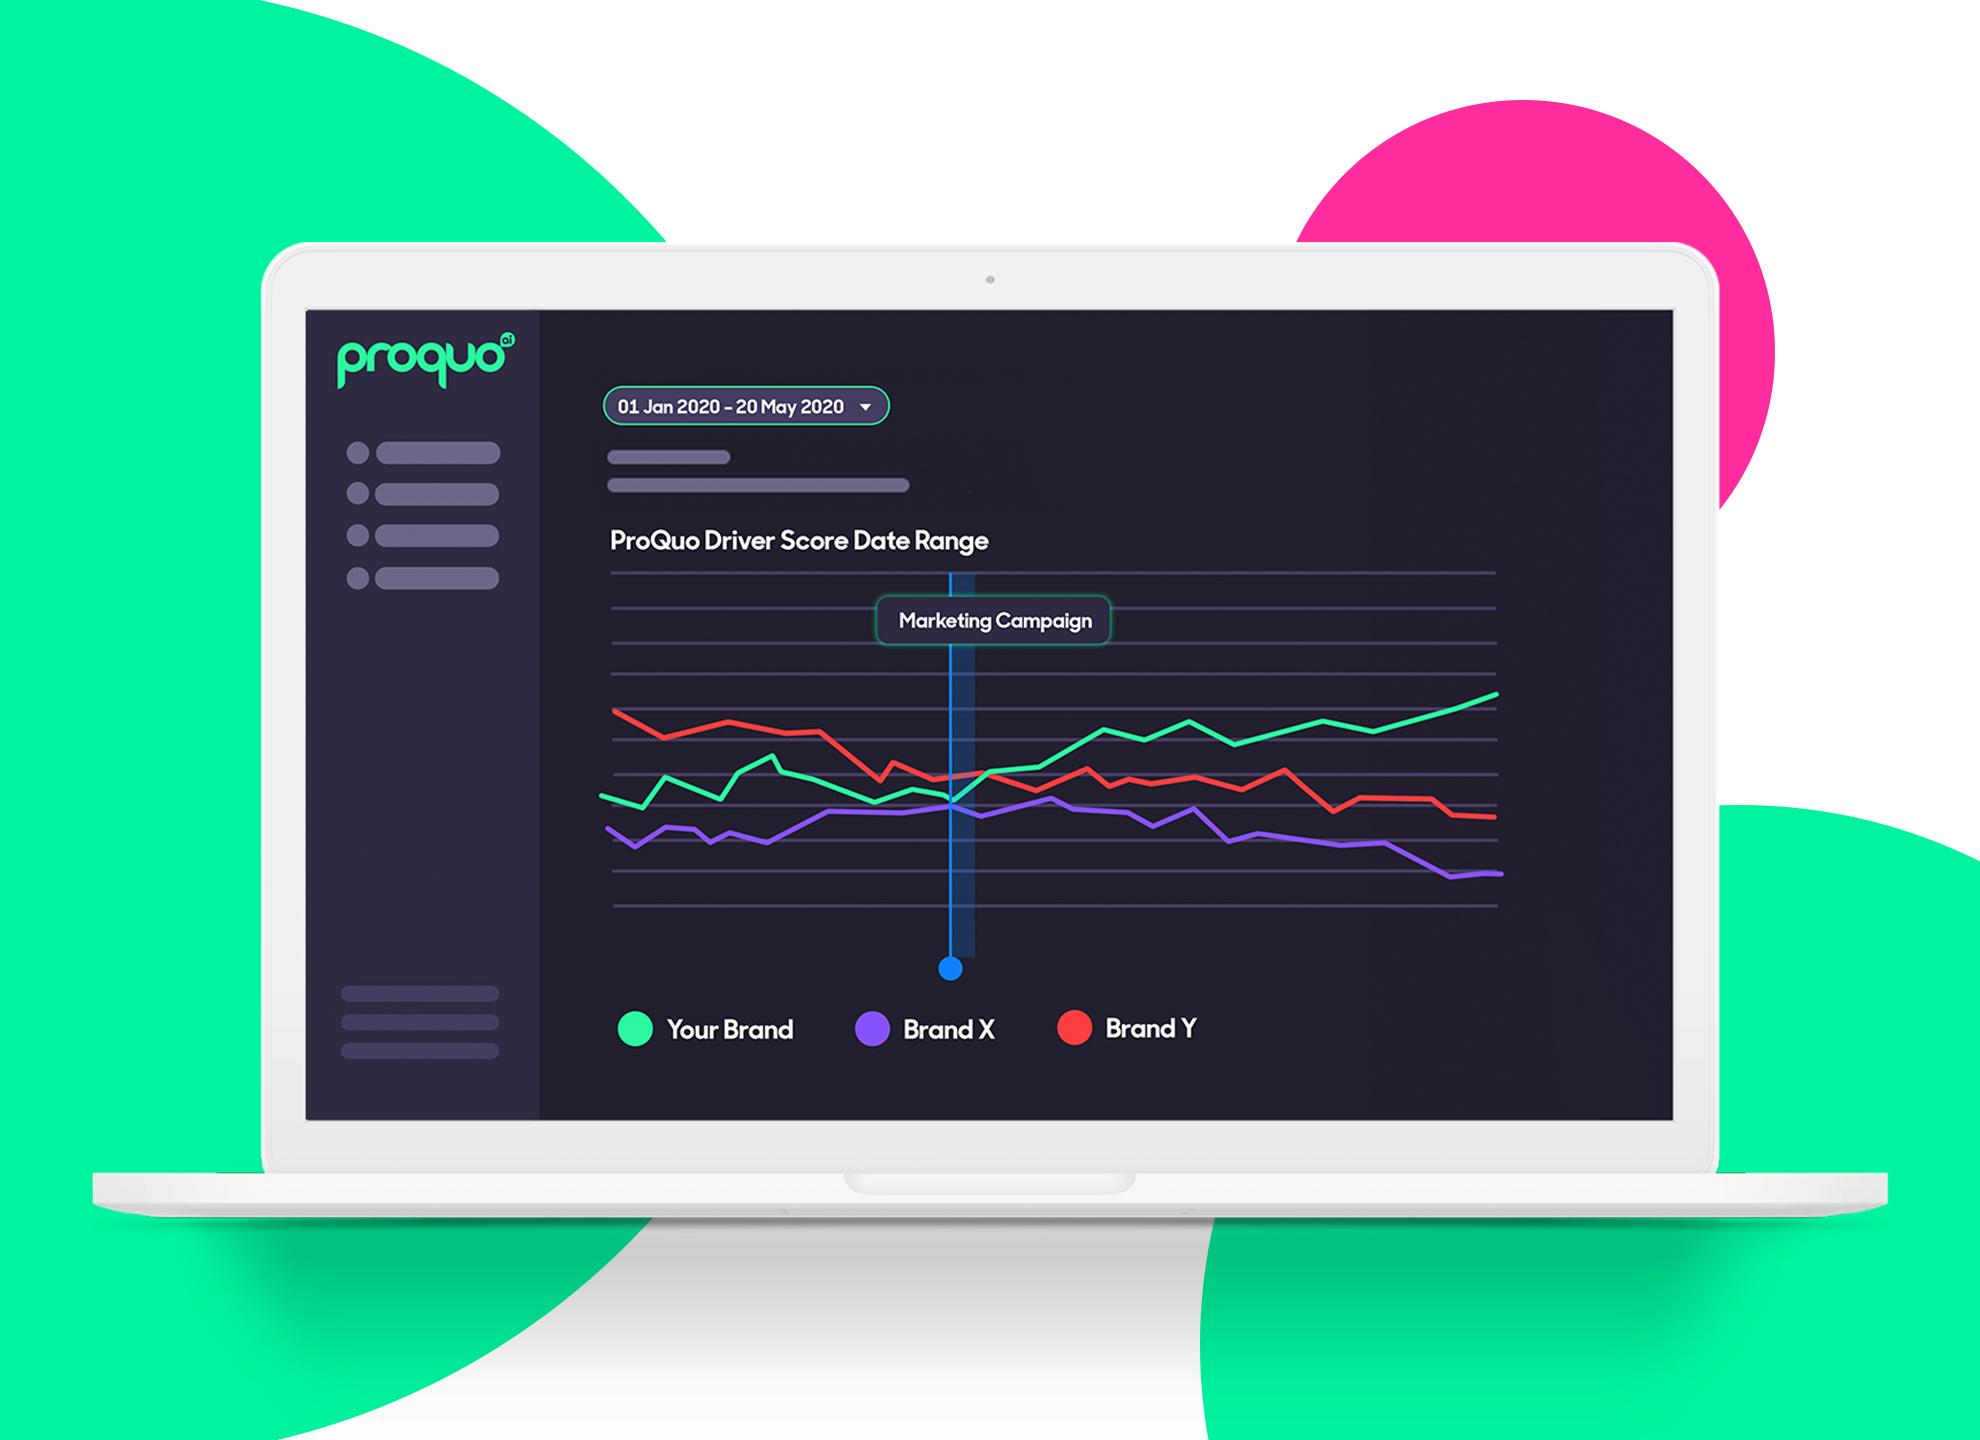 Desktop showing ProQuo AI's brand management platform measuring brands' marketing effectiveness